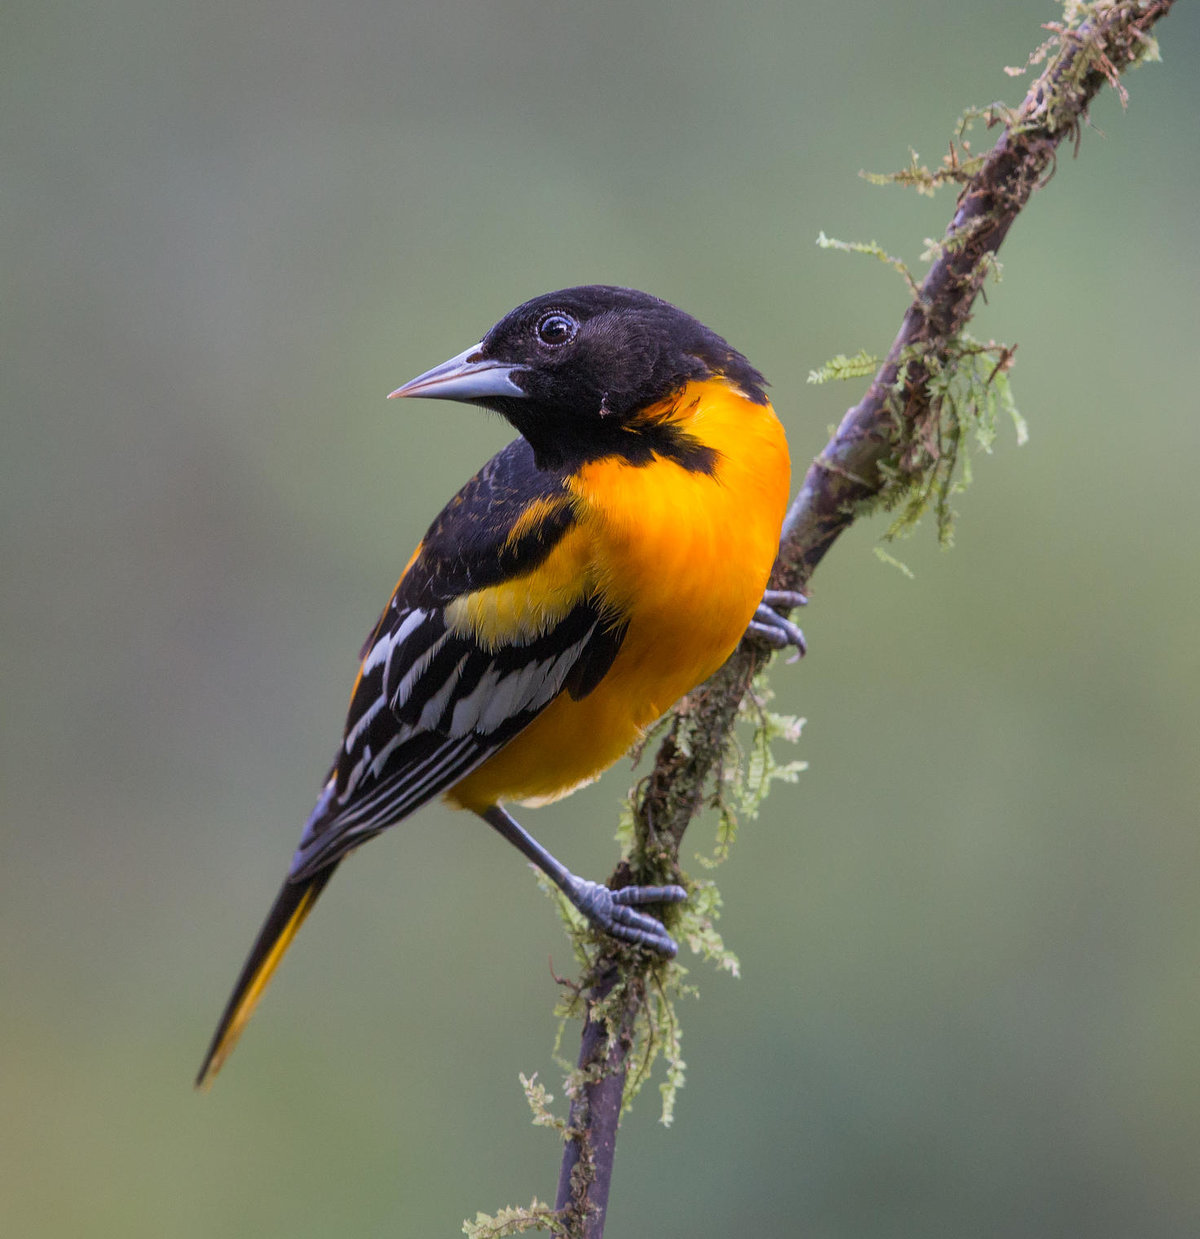 Картинки с птицей иволга